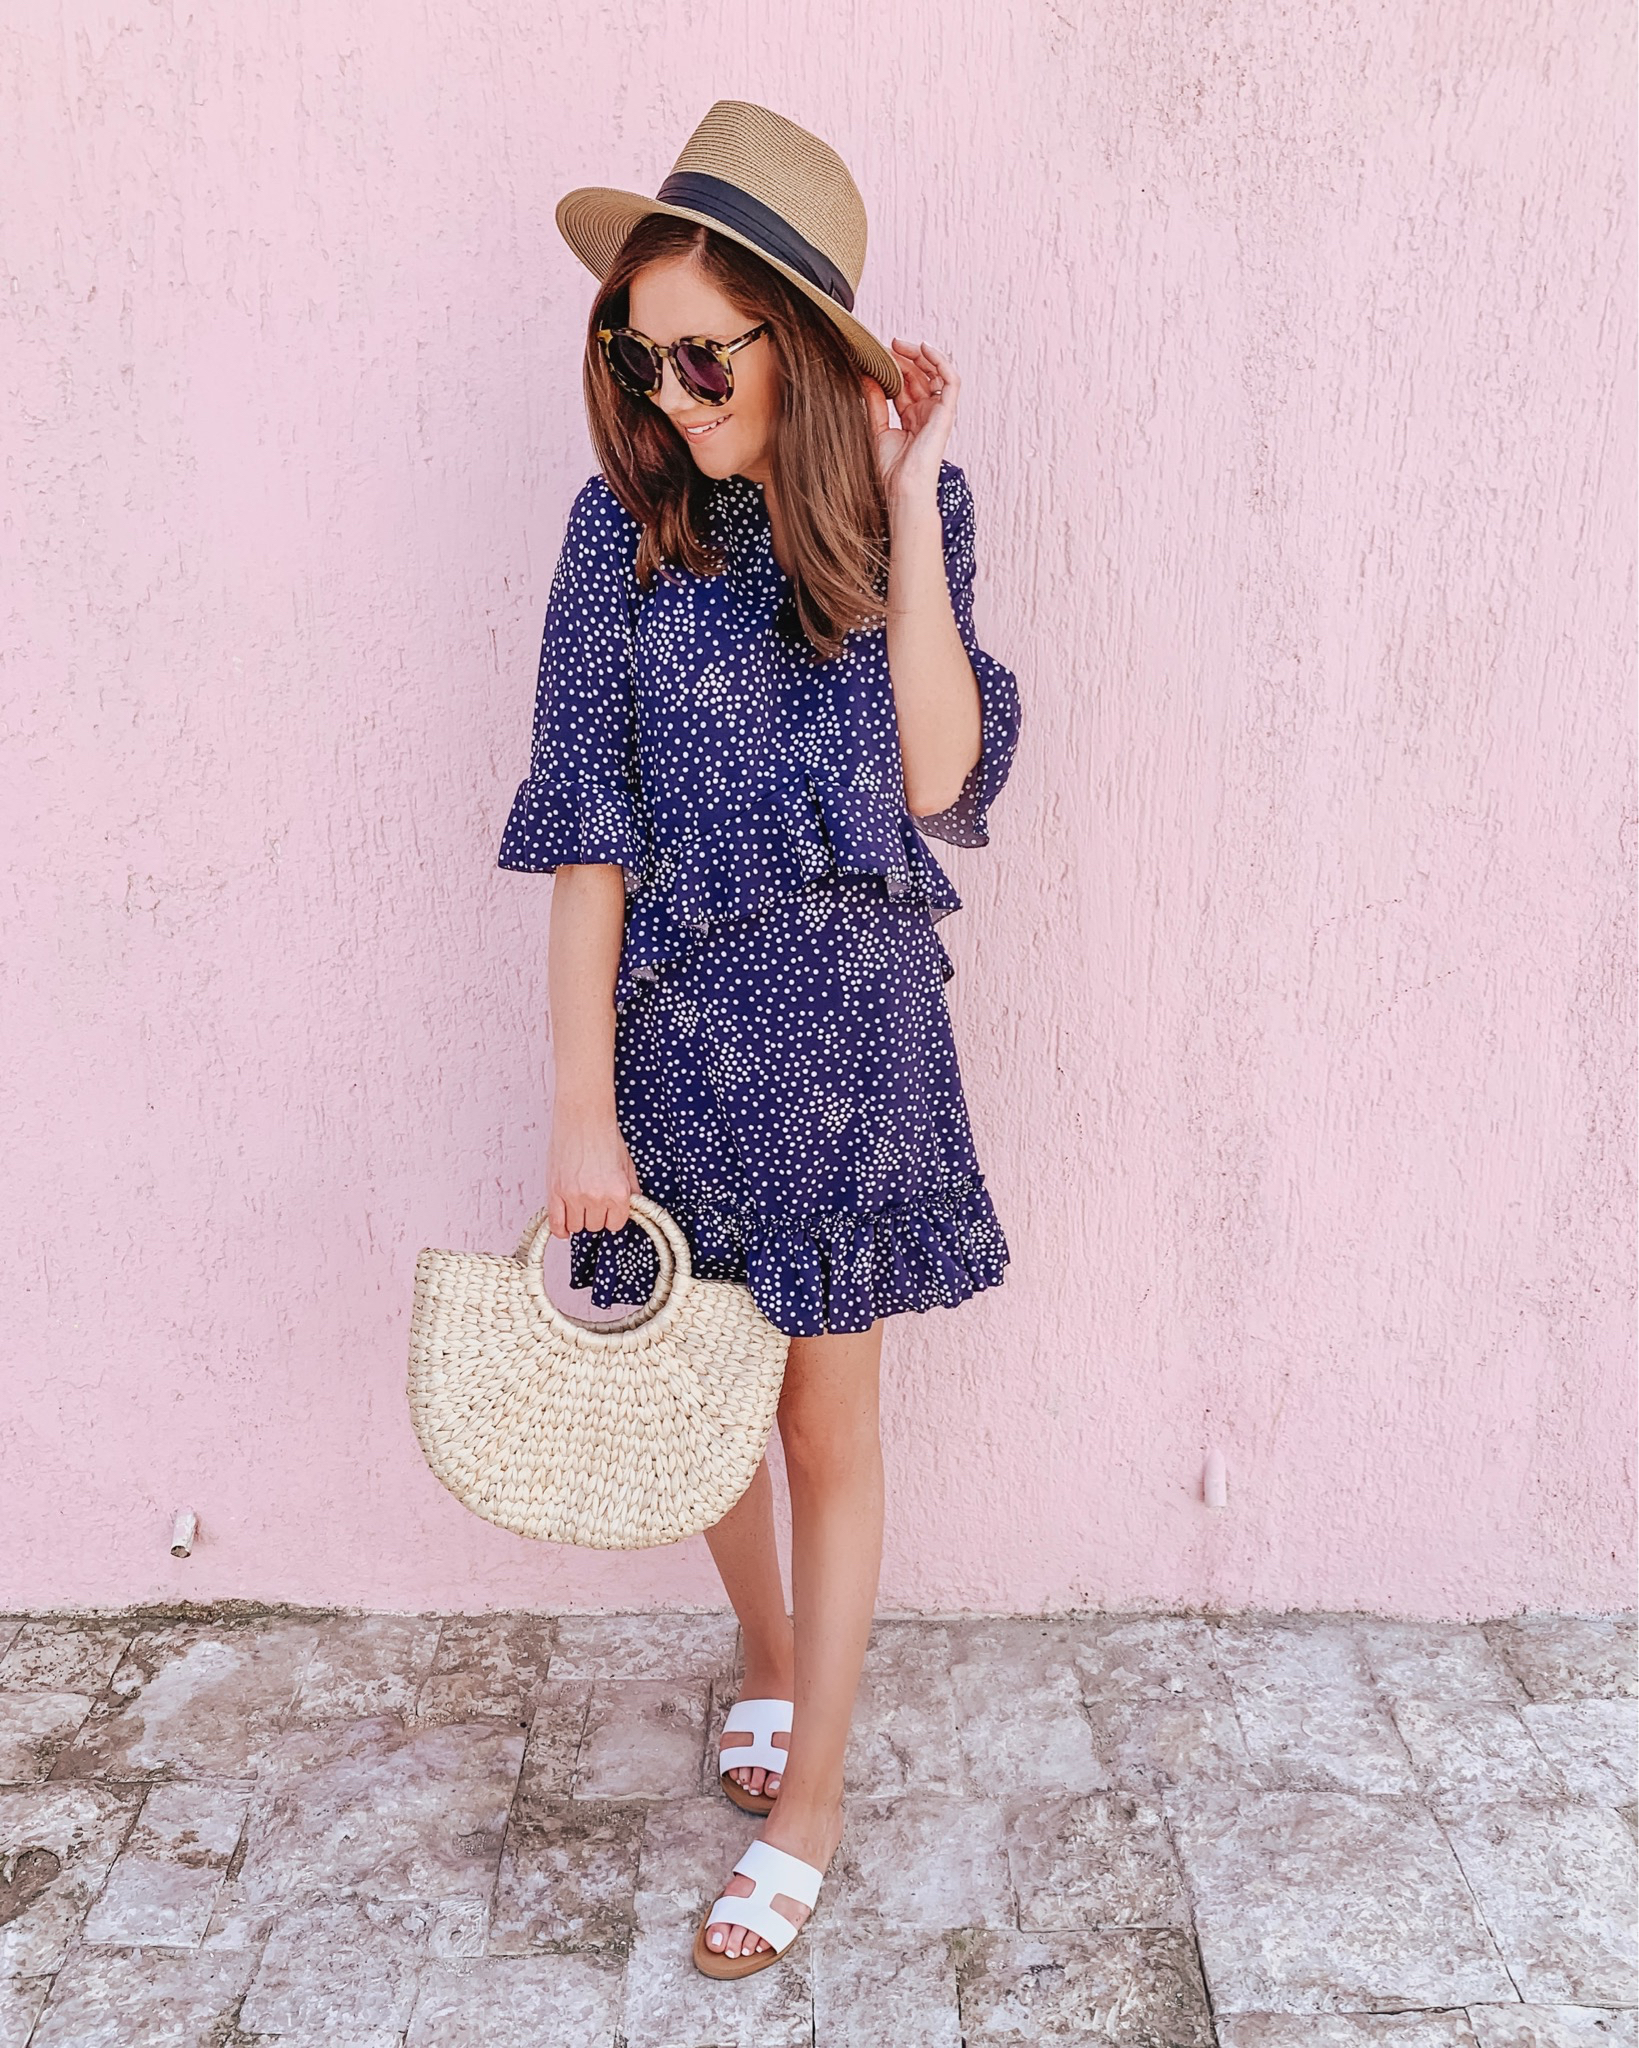 casual wardrobe basics, amazon fashion, ruffle polka dot dress, summer dress, vacation, outfit, pink wall